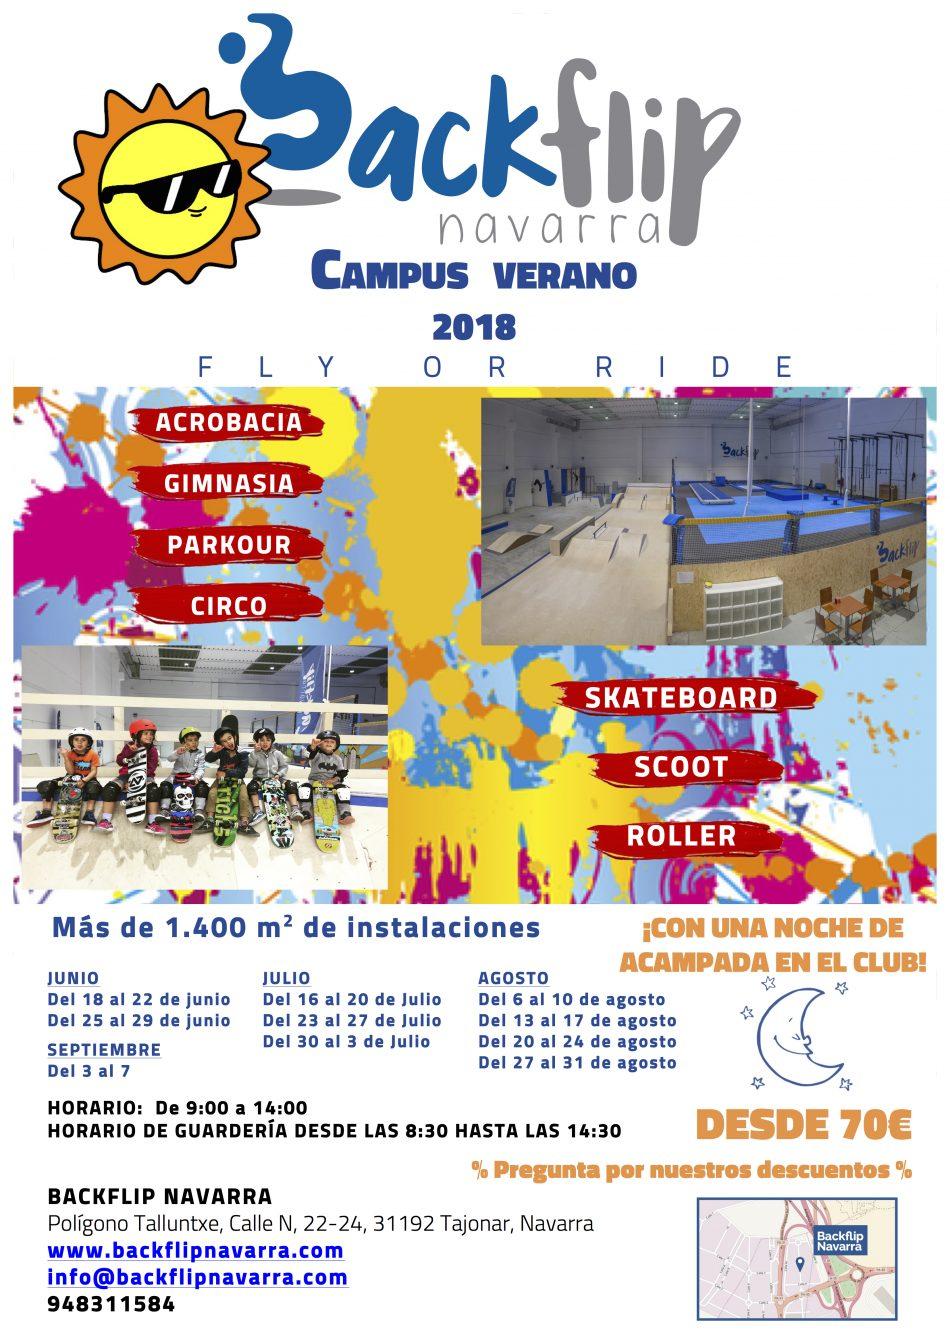 Campus Verano 2018